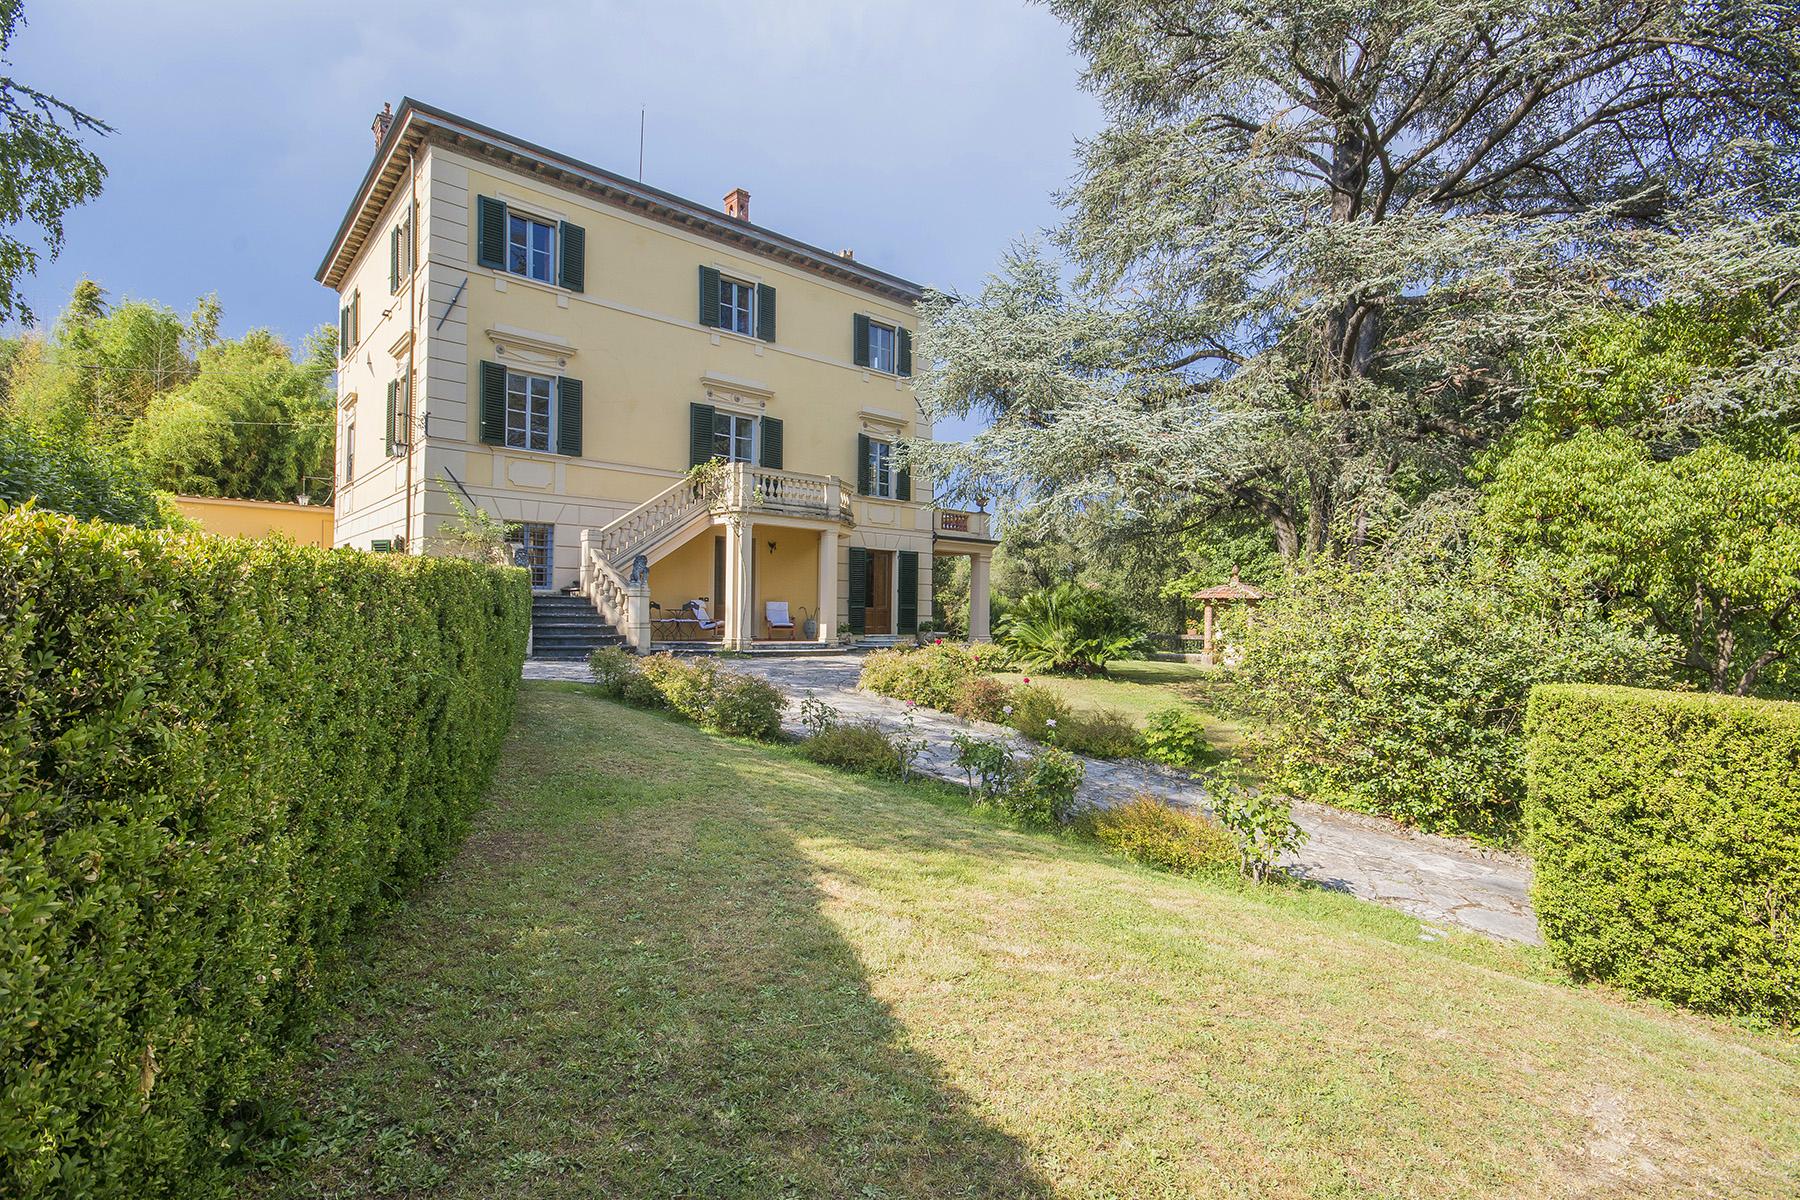 Villa in Vendita a Lucca: 5 locali, 1150 mq - Foto 15